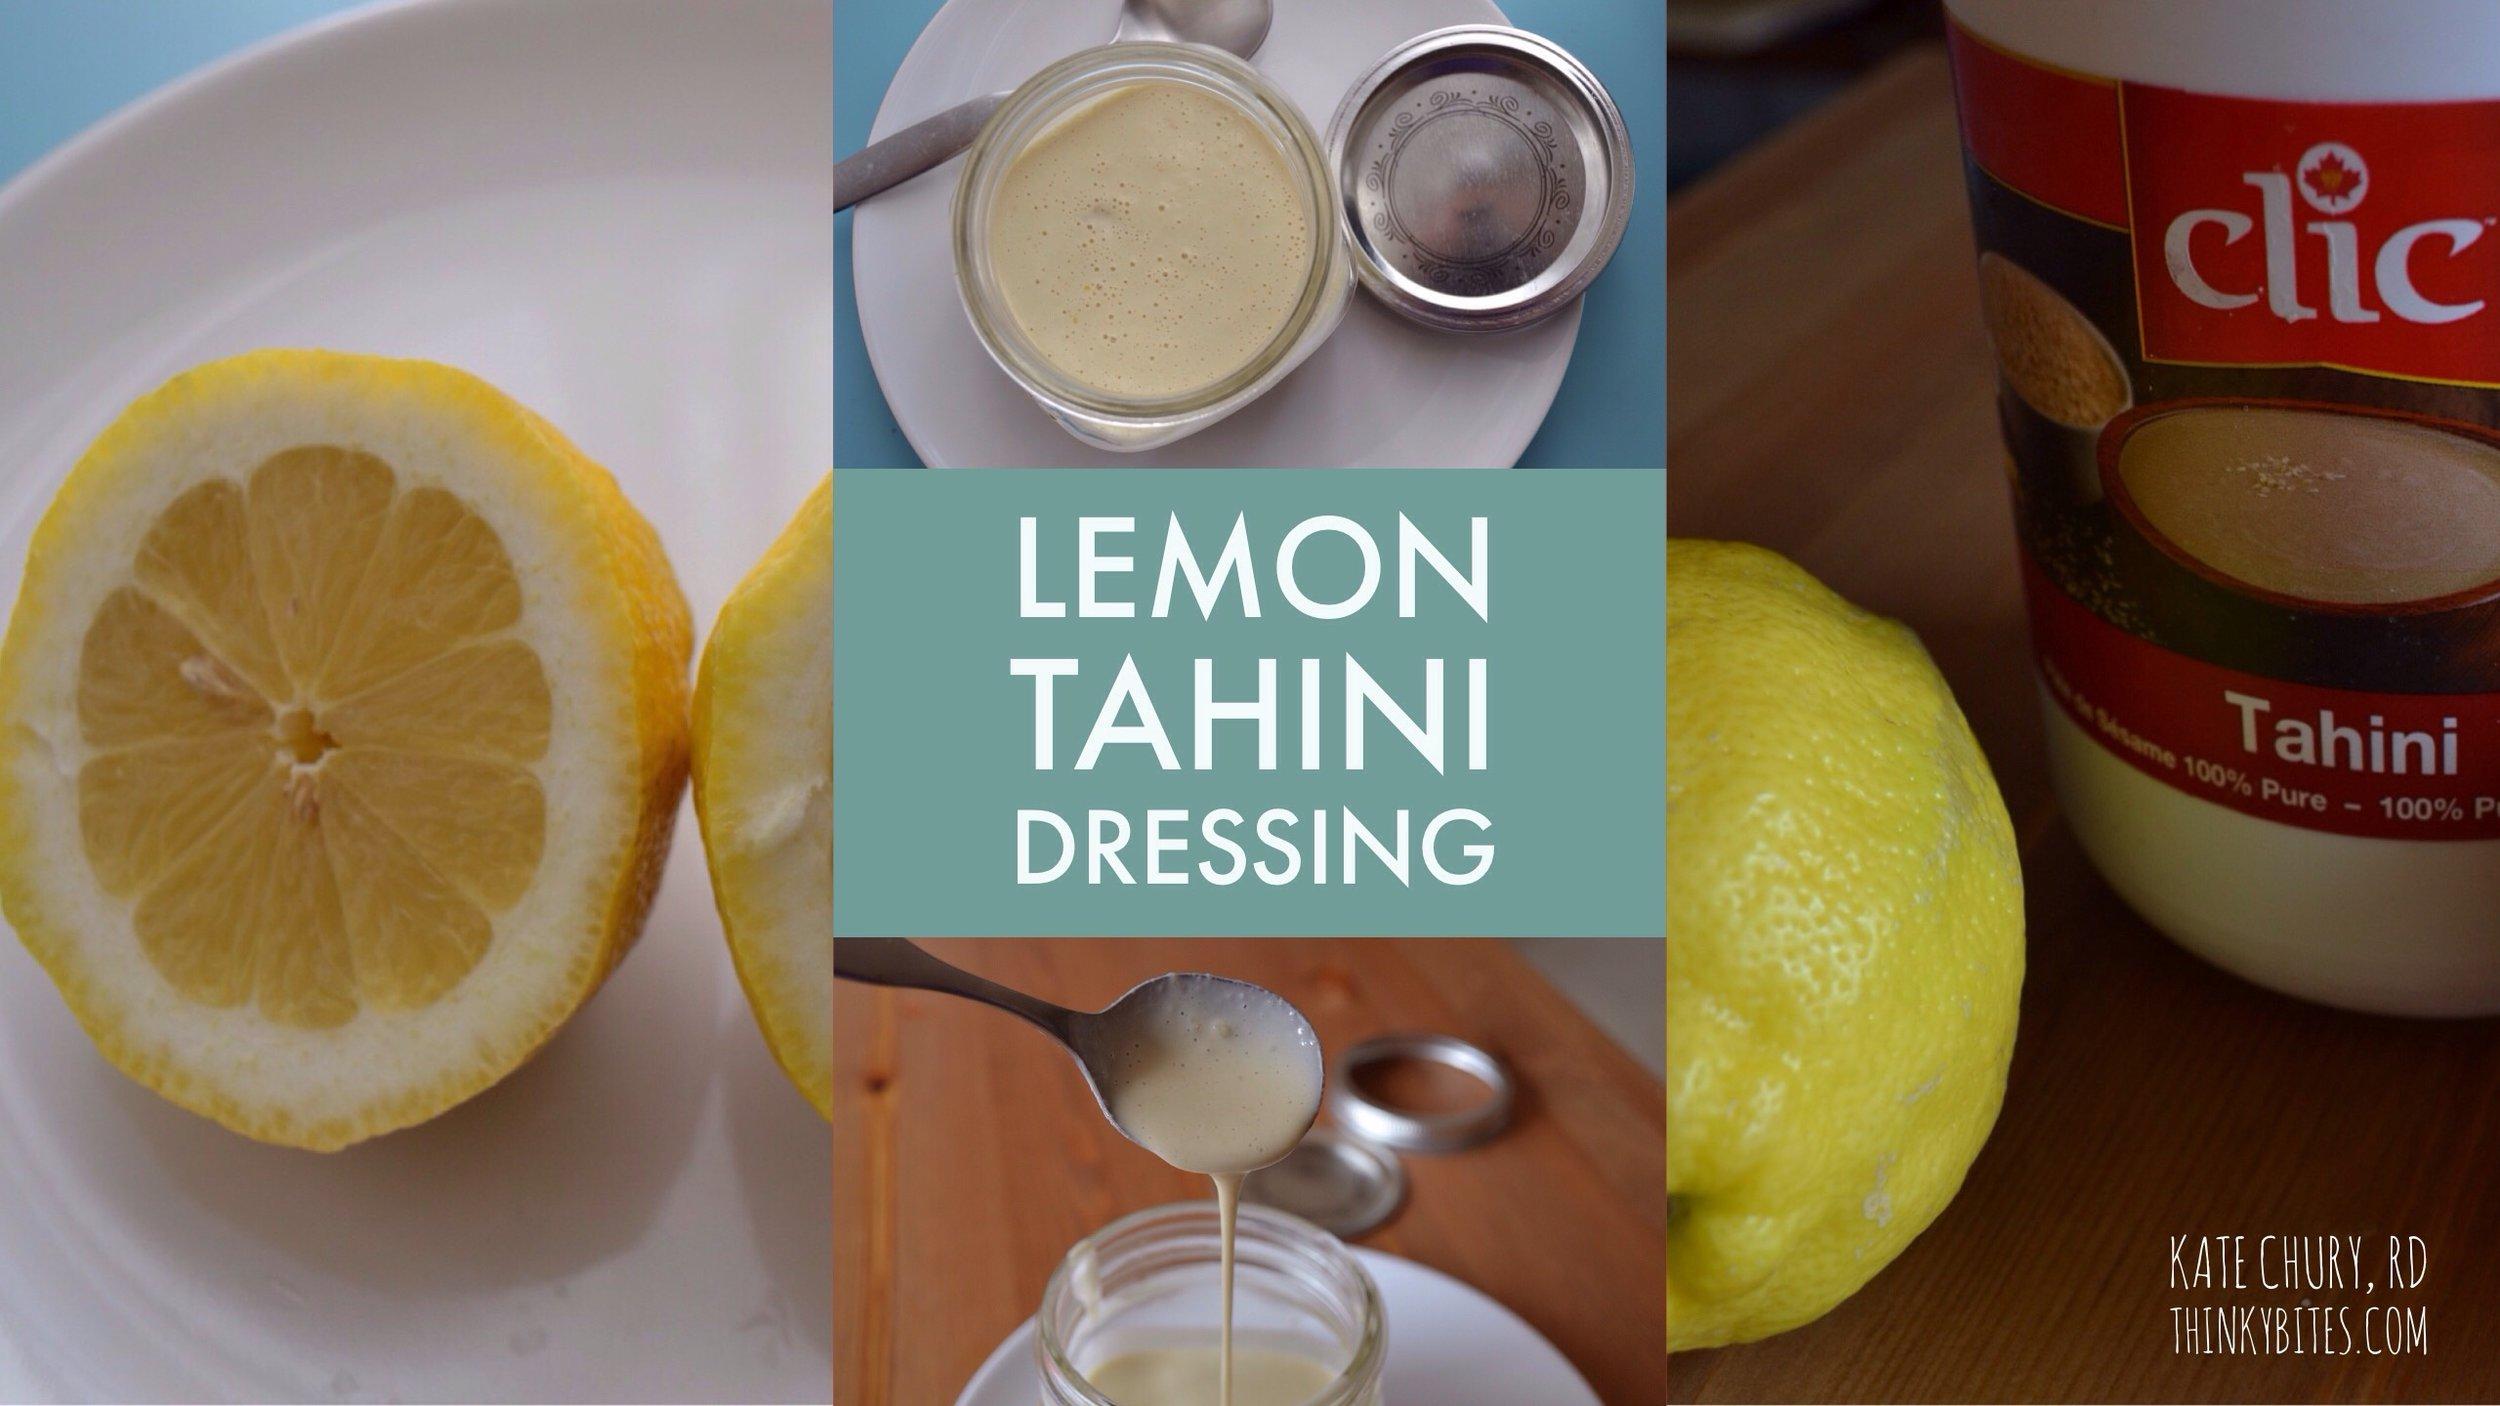 Lemon Tahini Dressing Northwest Calgary Registered Dietitian